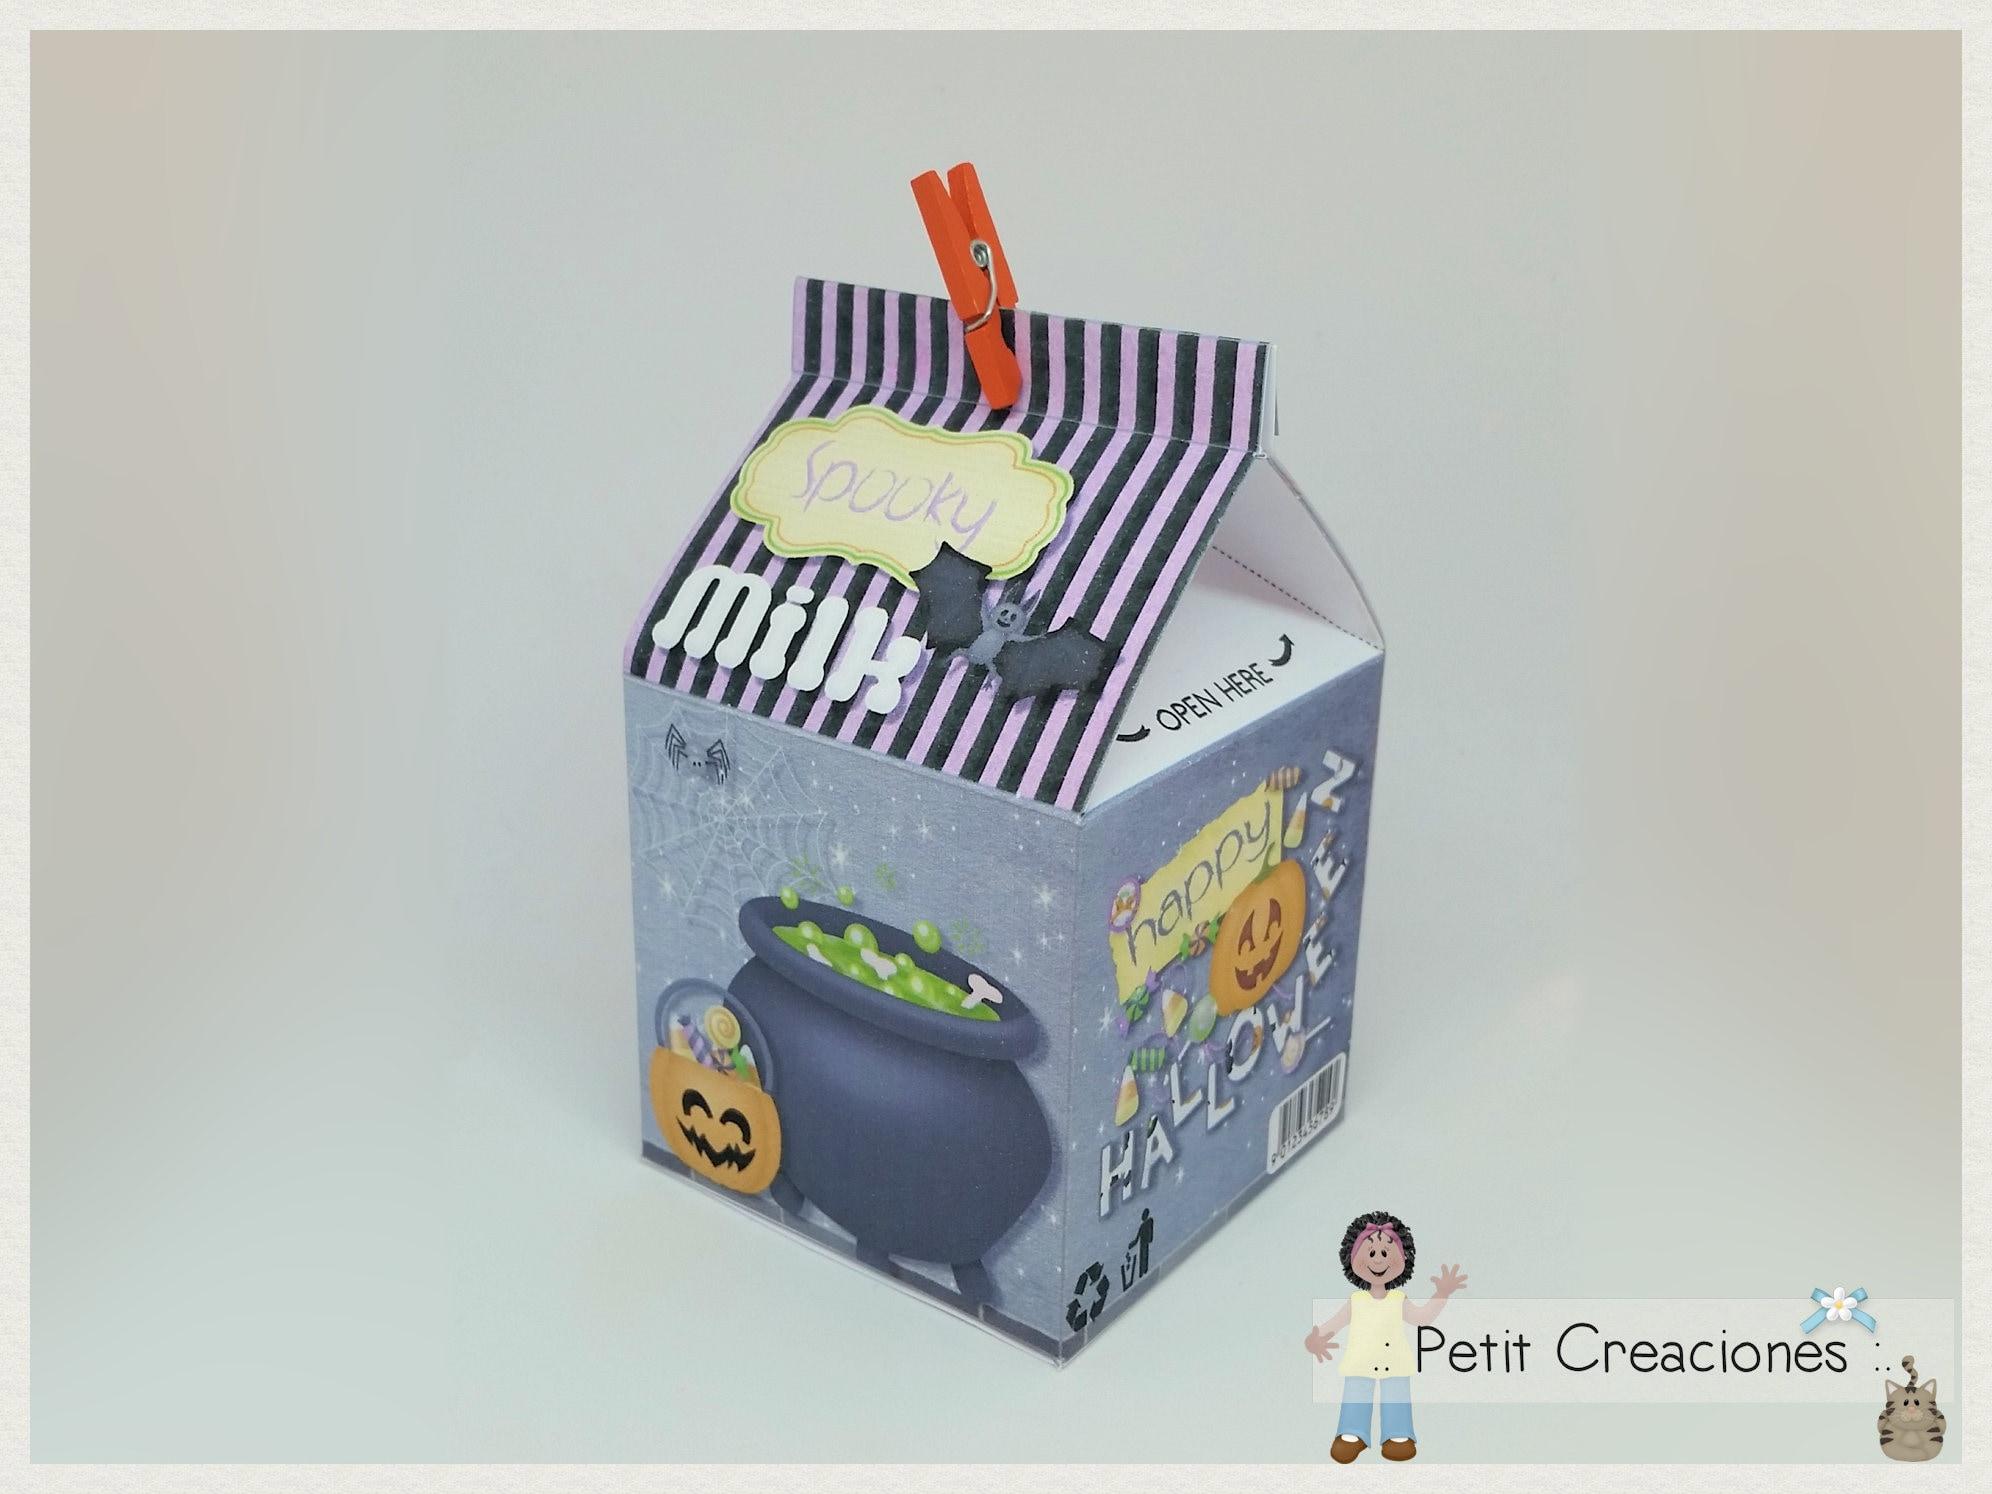 fa498767ccd2 PRINTABLE MILK Carton Spooky Milk DIY gift idea